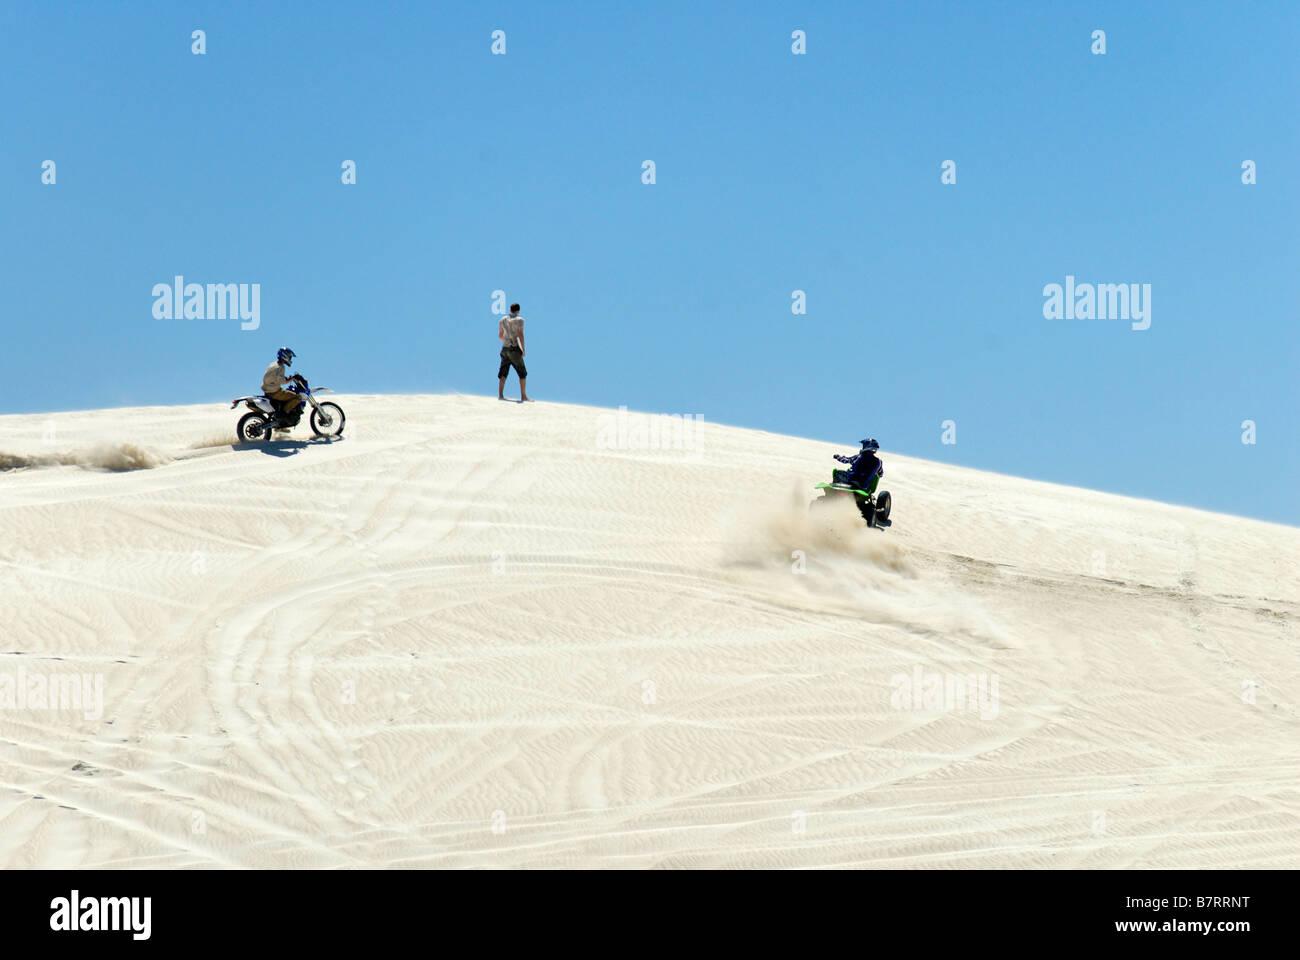 Quad bike motor bike on sand dunes outdoor leisure activities summer Western Australia - Stock Image